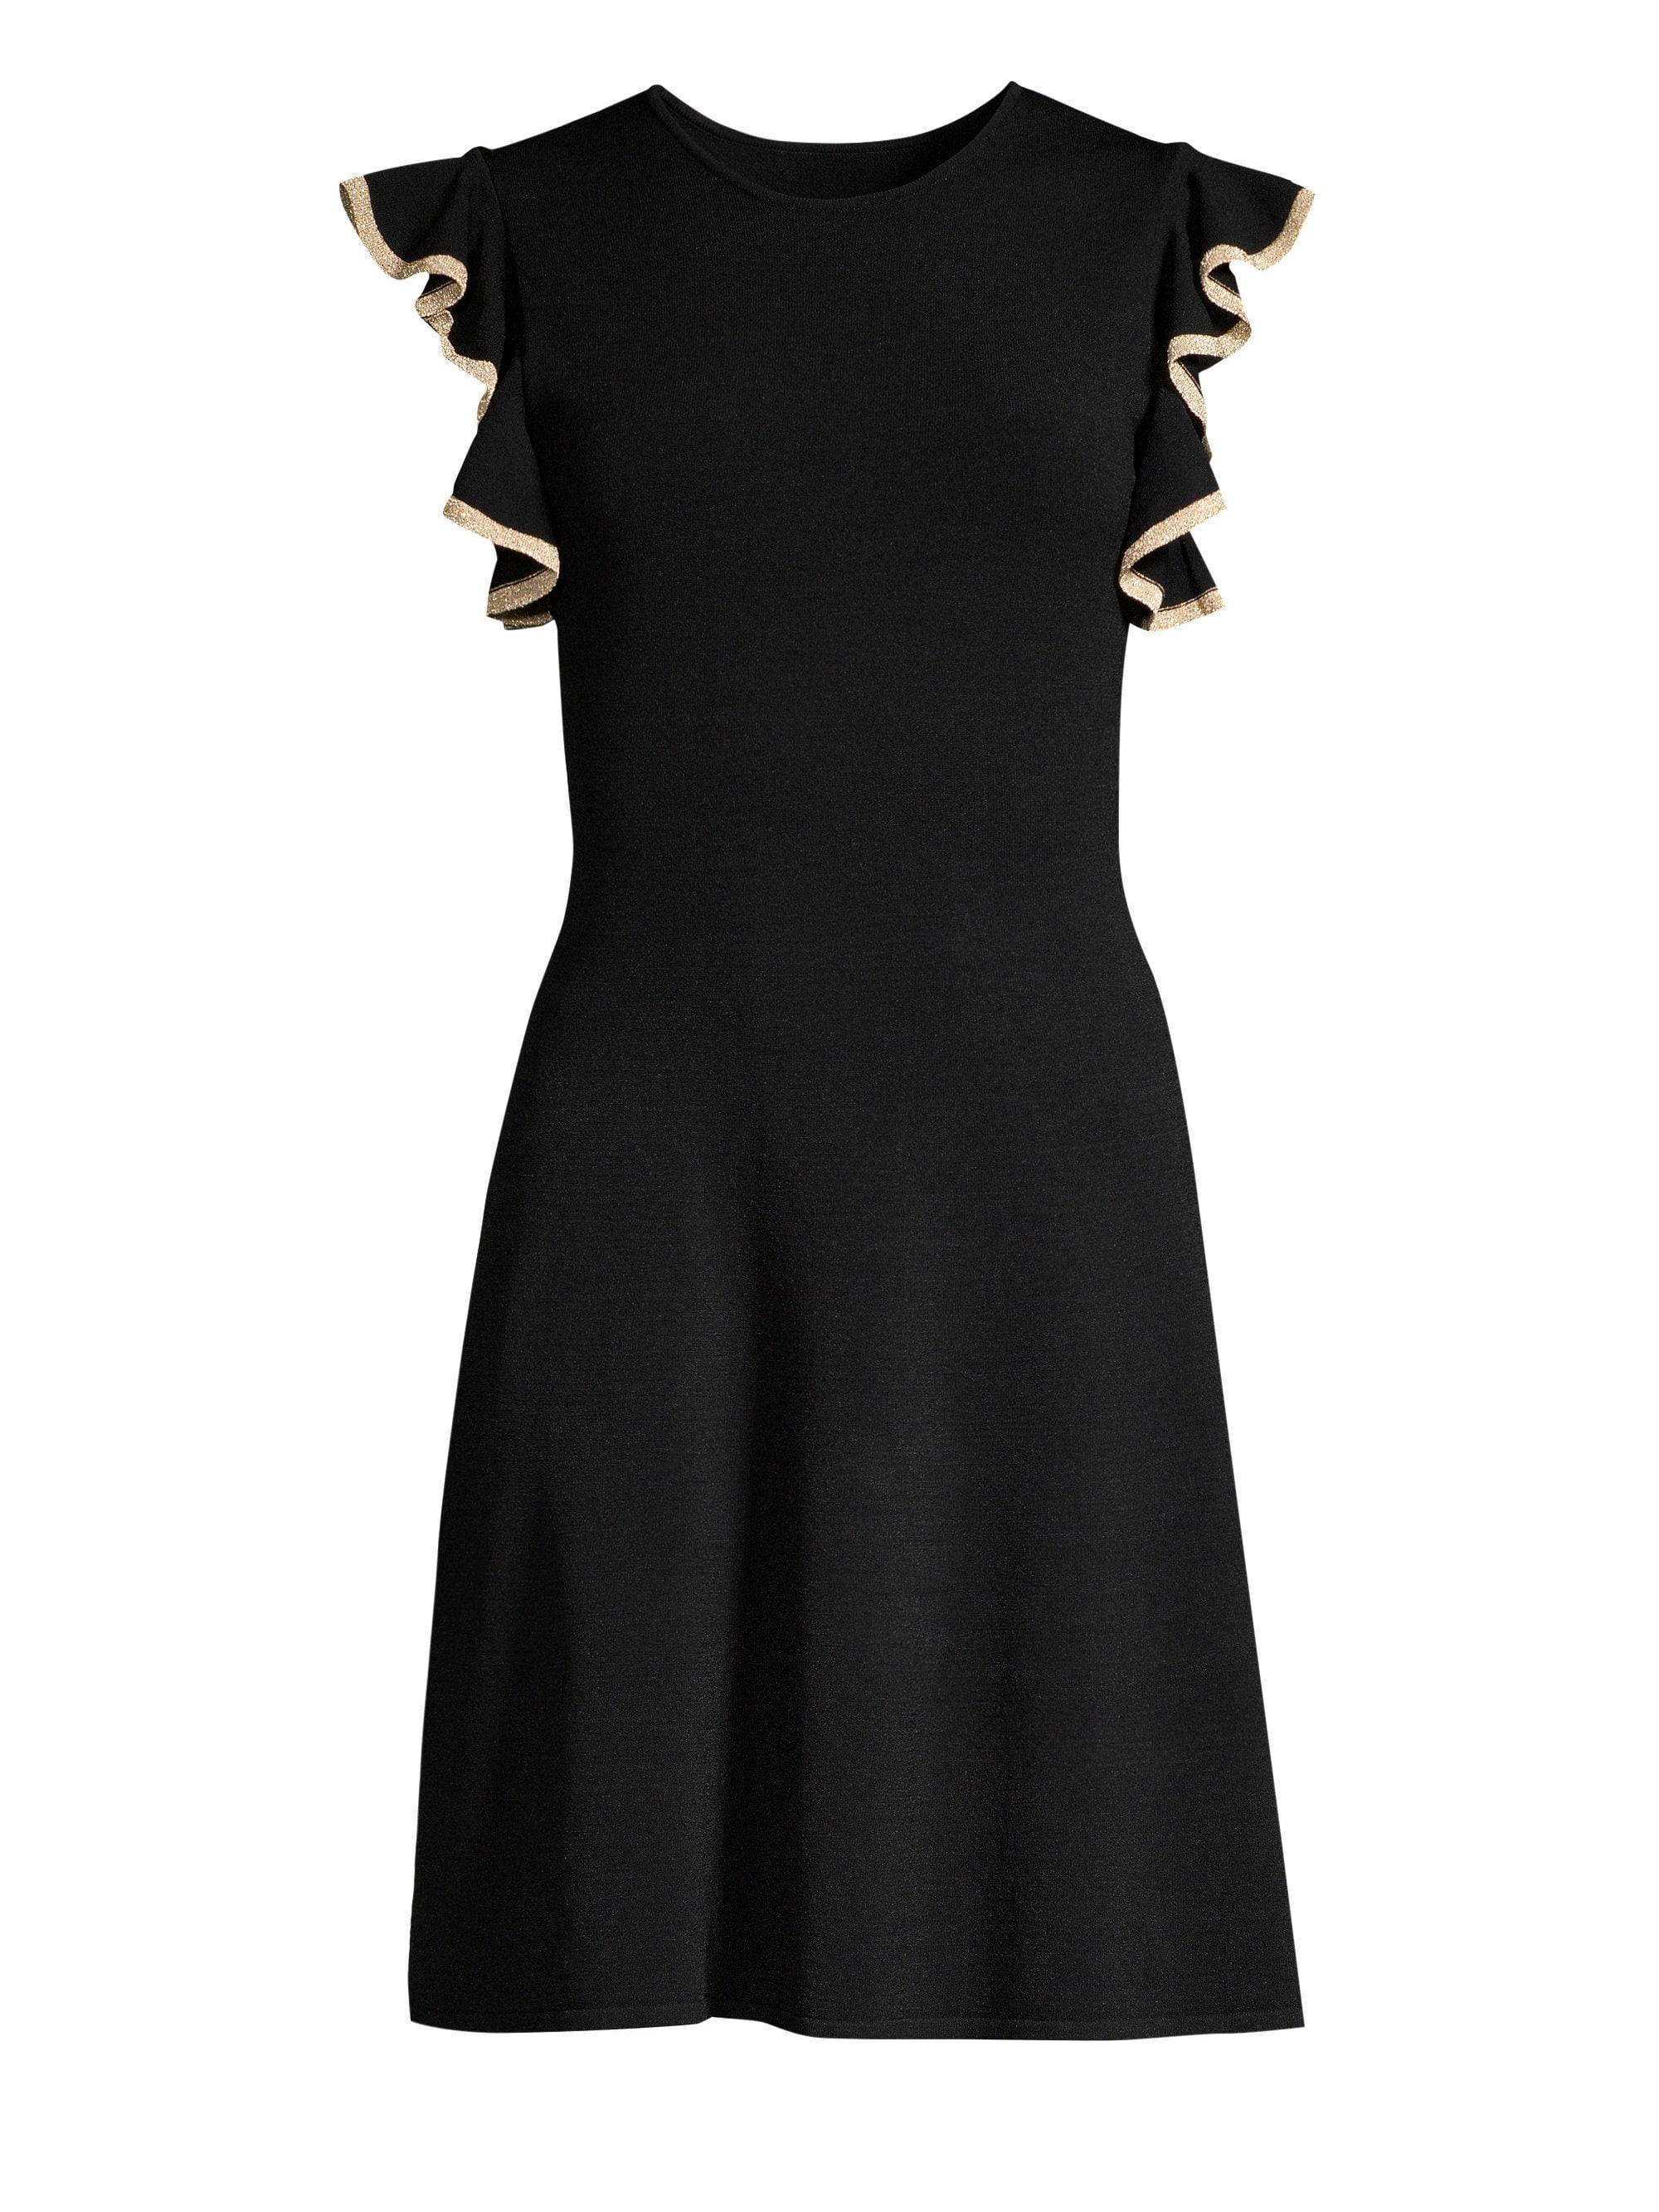 7f953a0ef48aa Lyst - Shoshanna Saya Knit Ruffle-trim Dress in Black - Save 75%